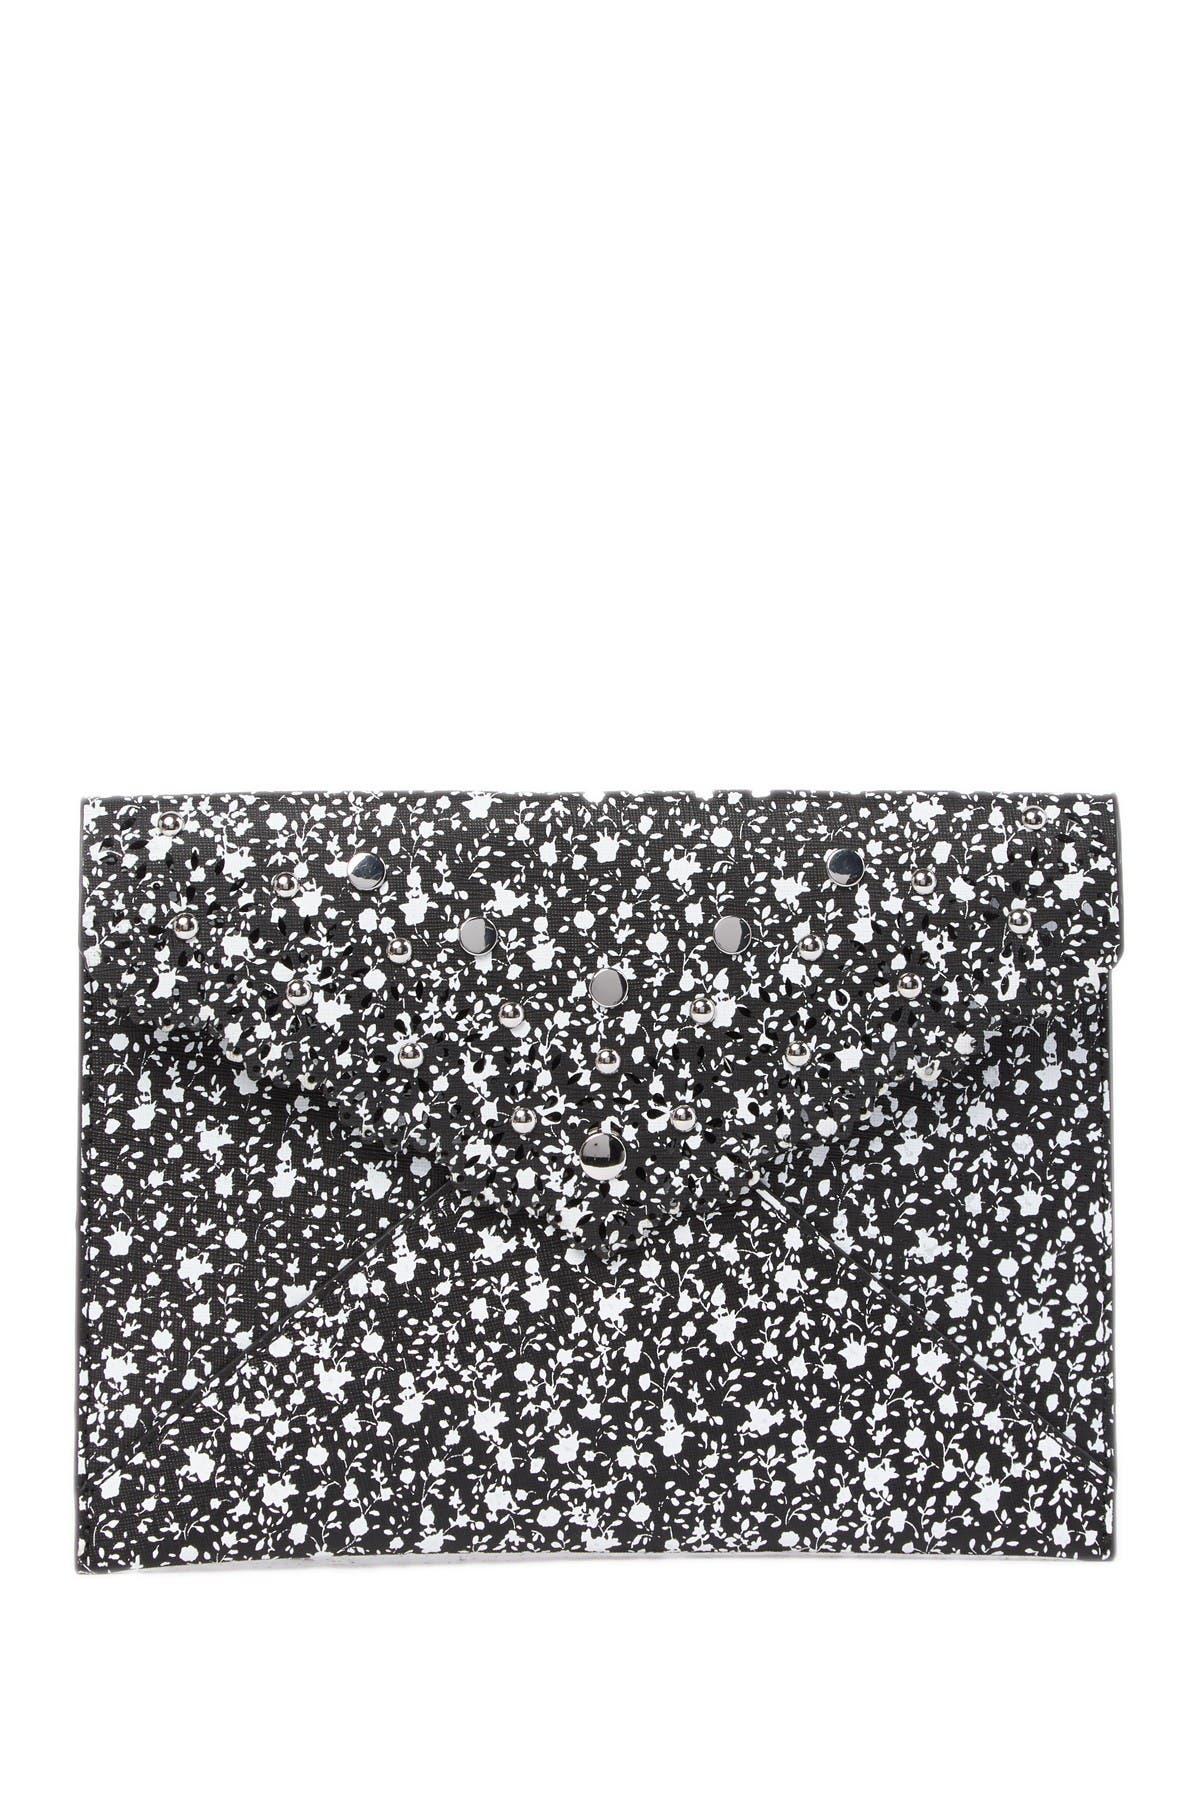 Image of Rebecca Minkoff Leo Leather Envelope Clutch